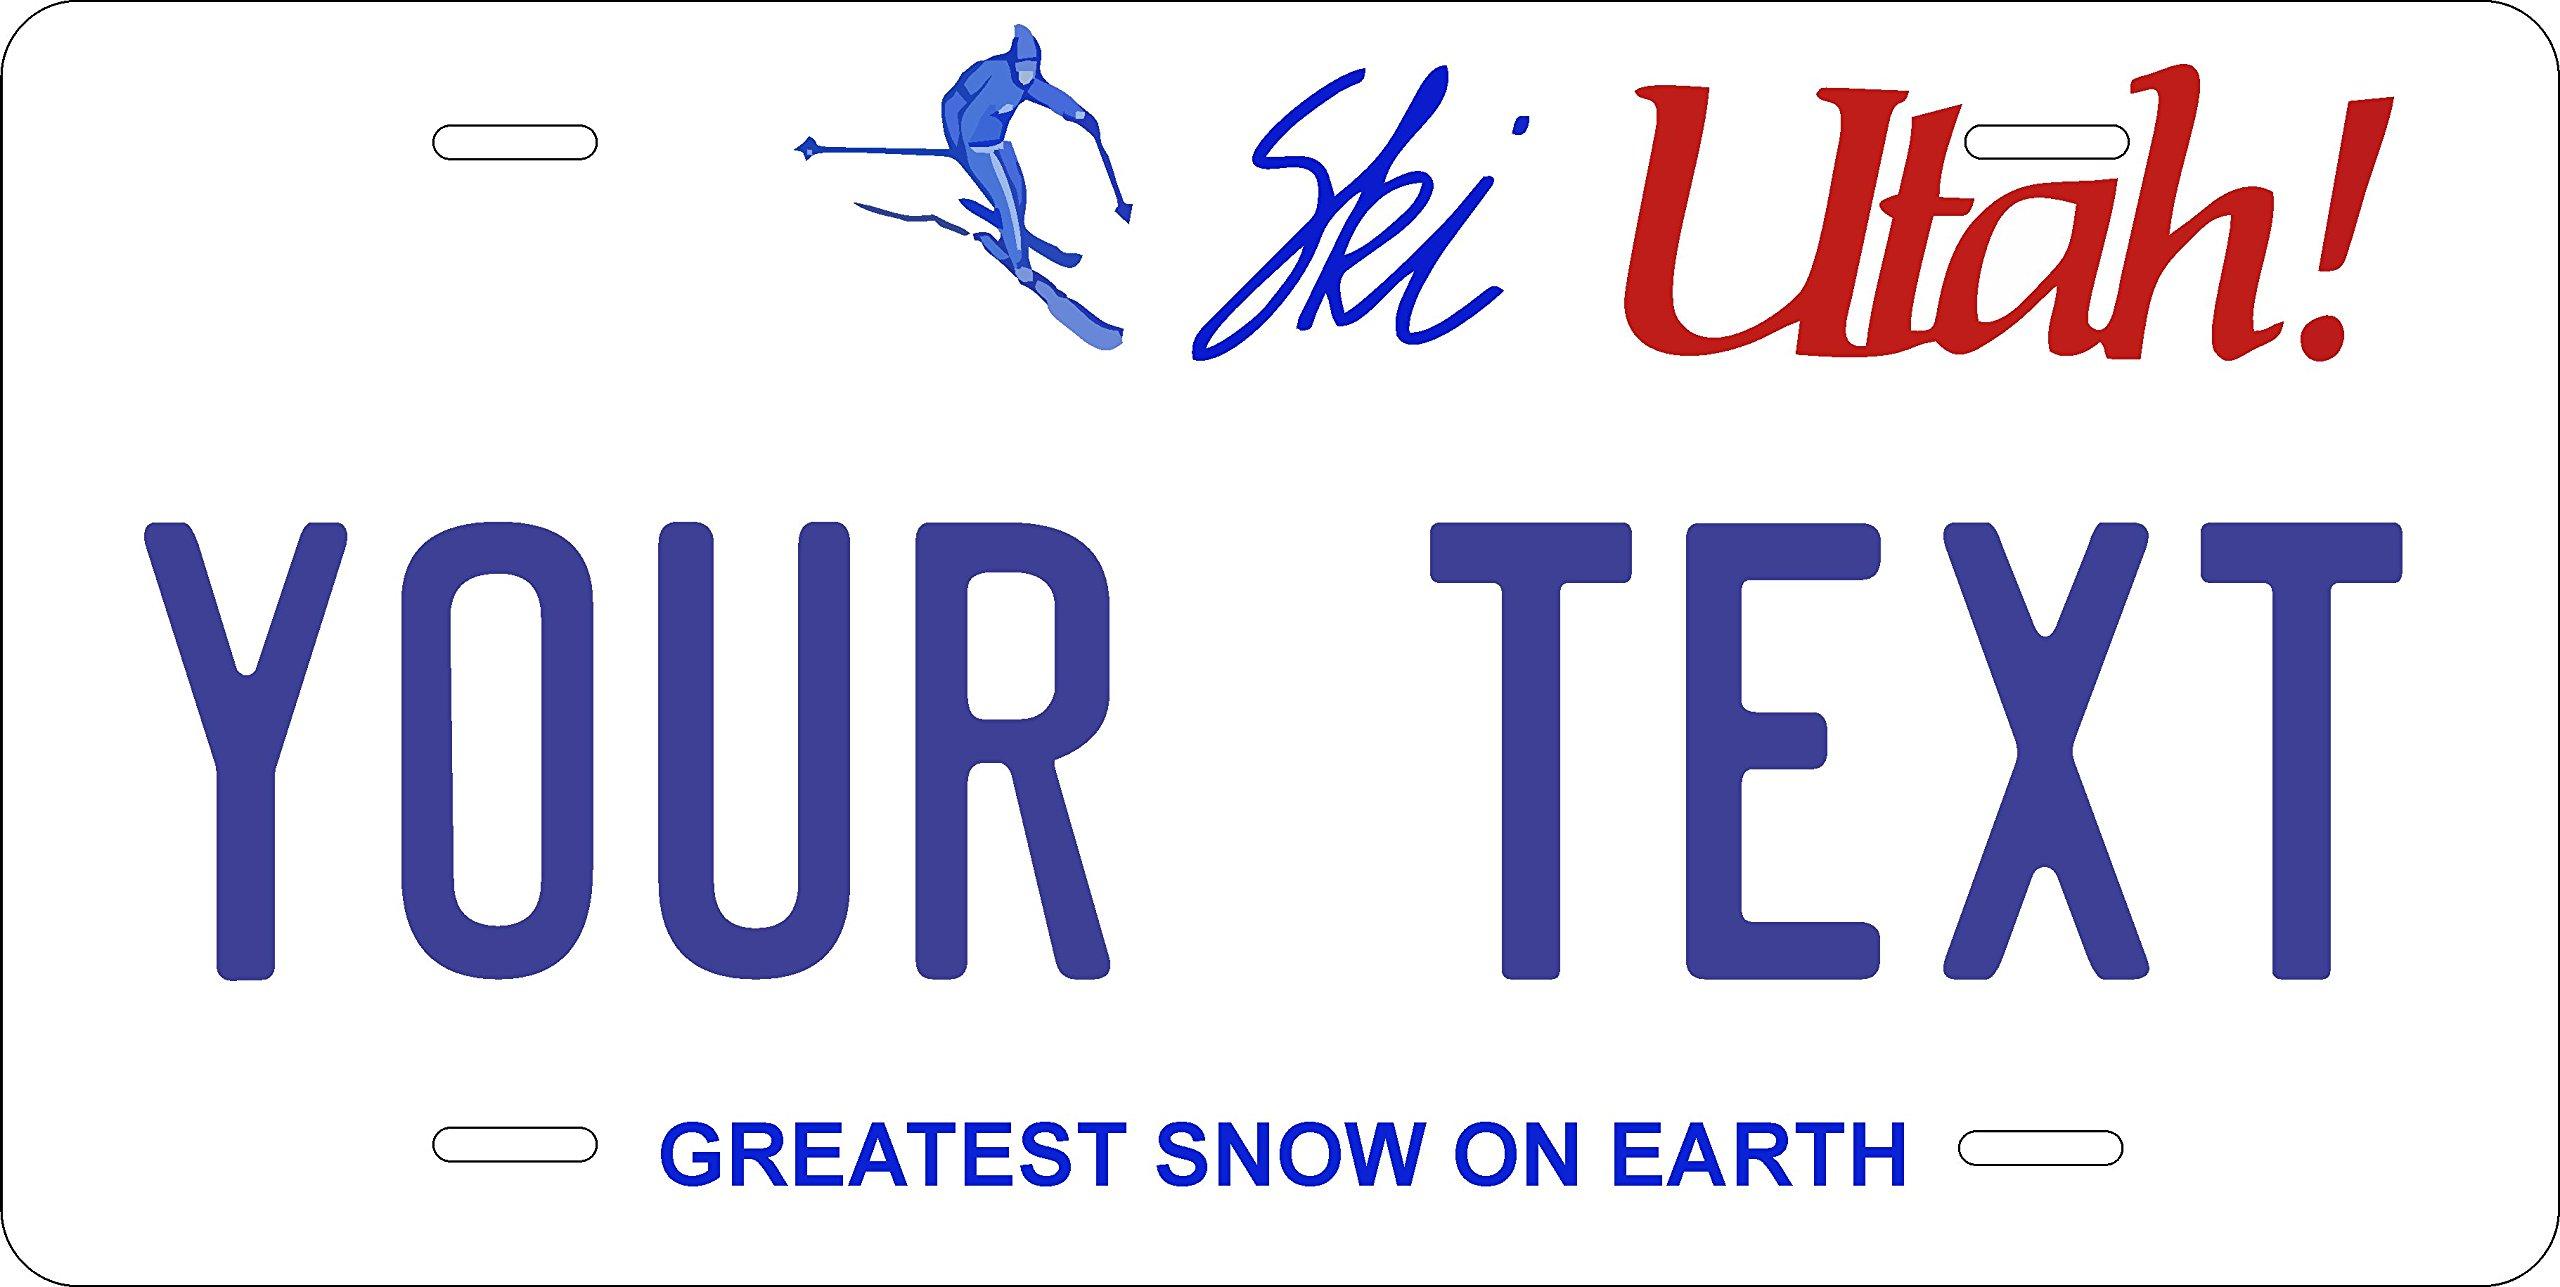 Buy Utah Ski Personalized Tag Vehicle Car Moped Bike Bicycle ...